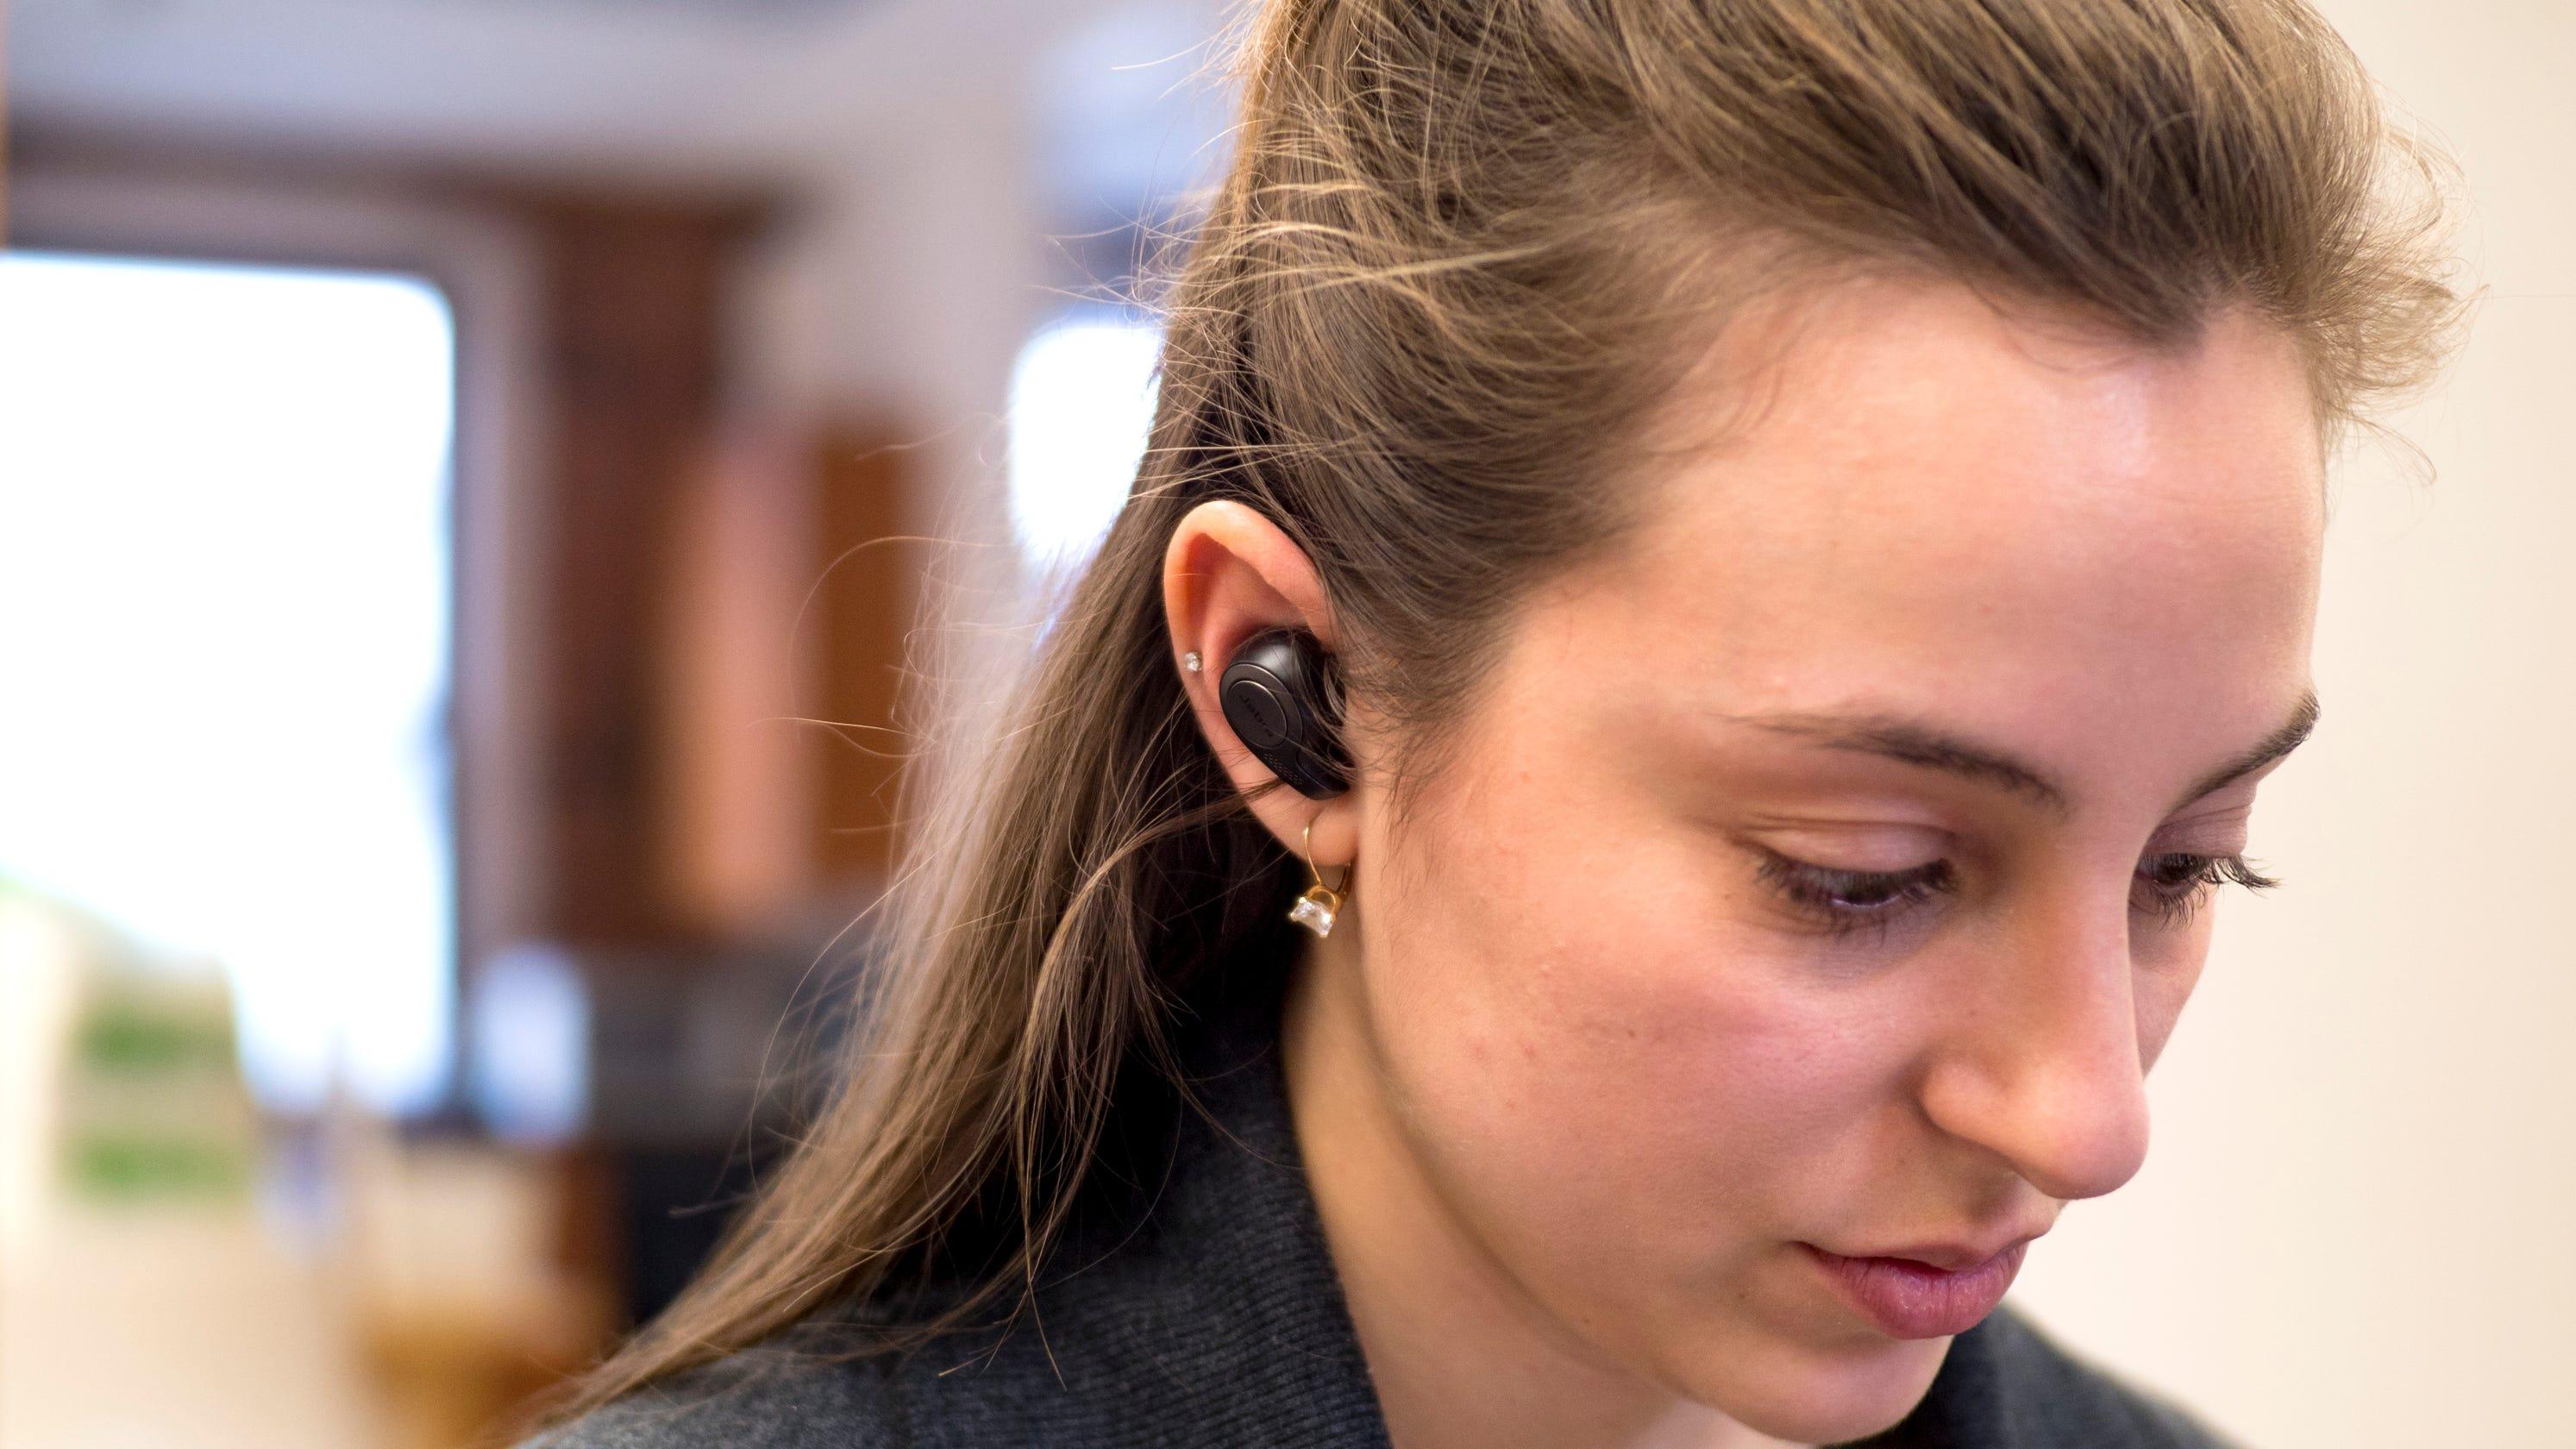 Jabra Elite 65t Deal Get Our Favorite True Wireless Headphones For Super Cheap